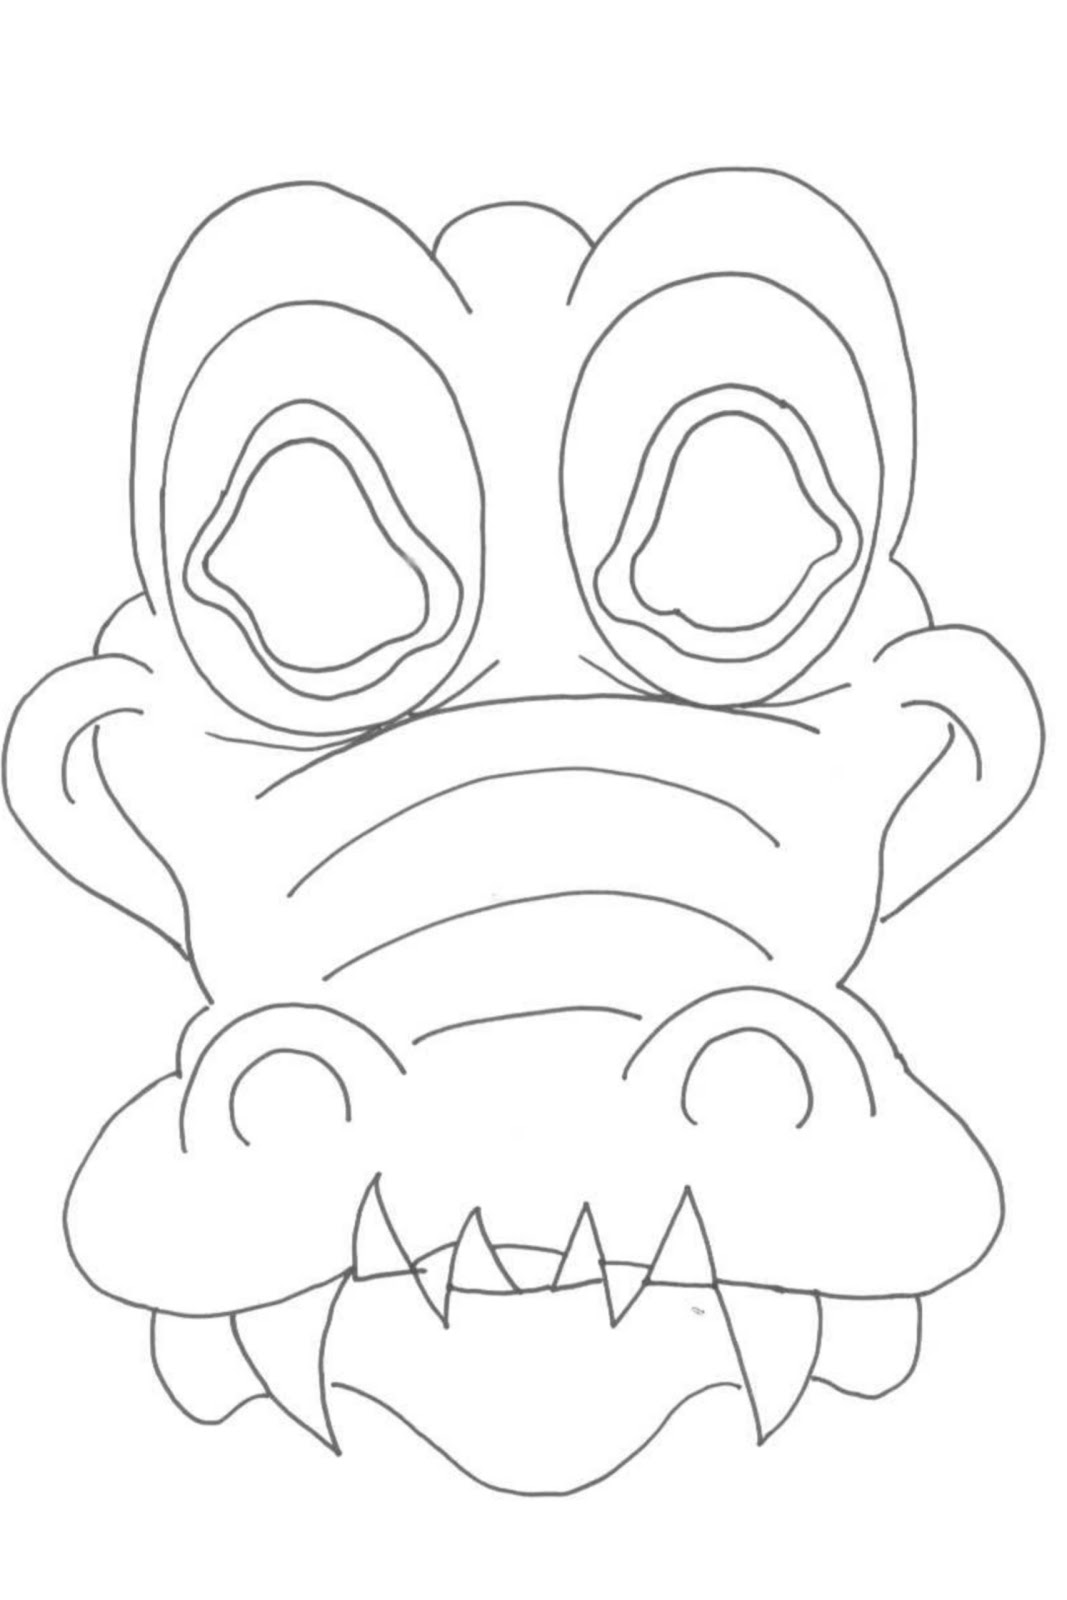 http://3.bp.blogspot.com/-7oGkJkKpMUk/T8fUUwawc5I/AAAAAAAAA7U/16hgwpOkCJs/s1600/mascara+modificada+2.jpg